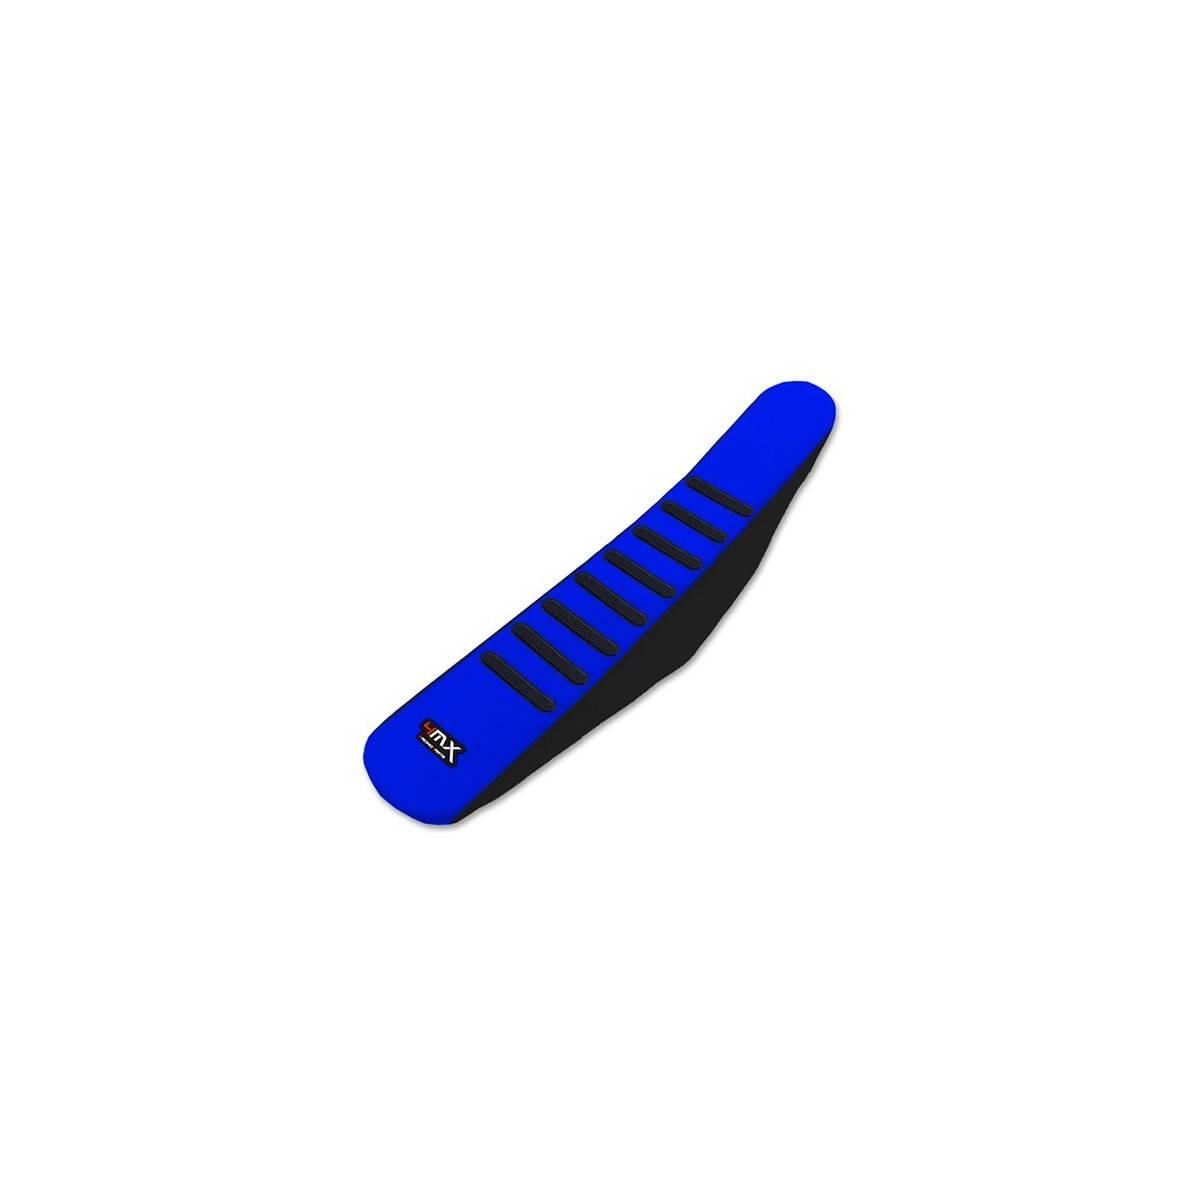 01CAP1020 - Funsa Sillon 4Mx Yamaha Yz 125 144 250 02 14´ Negro Azul